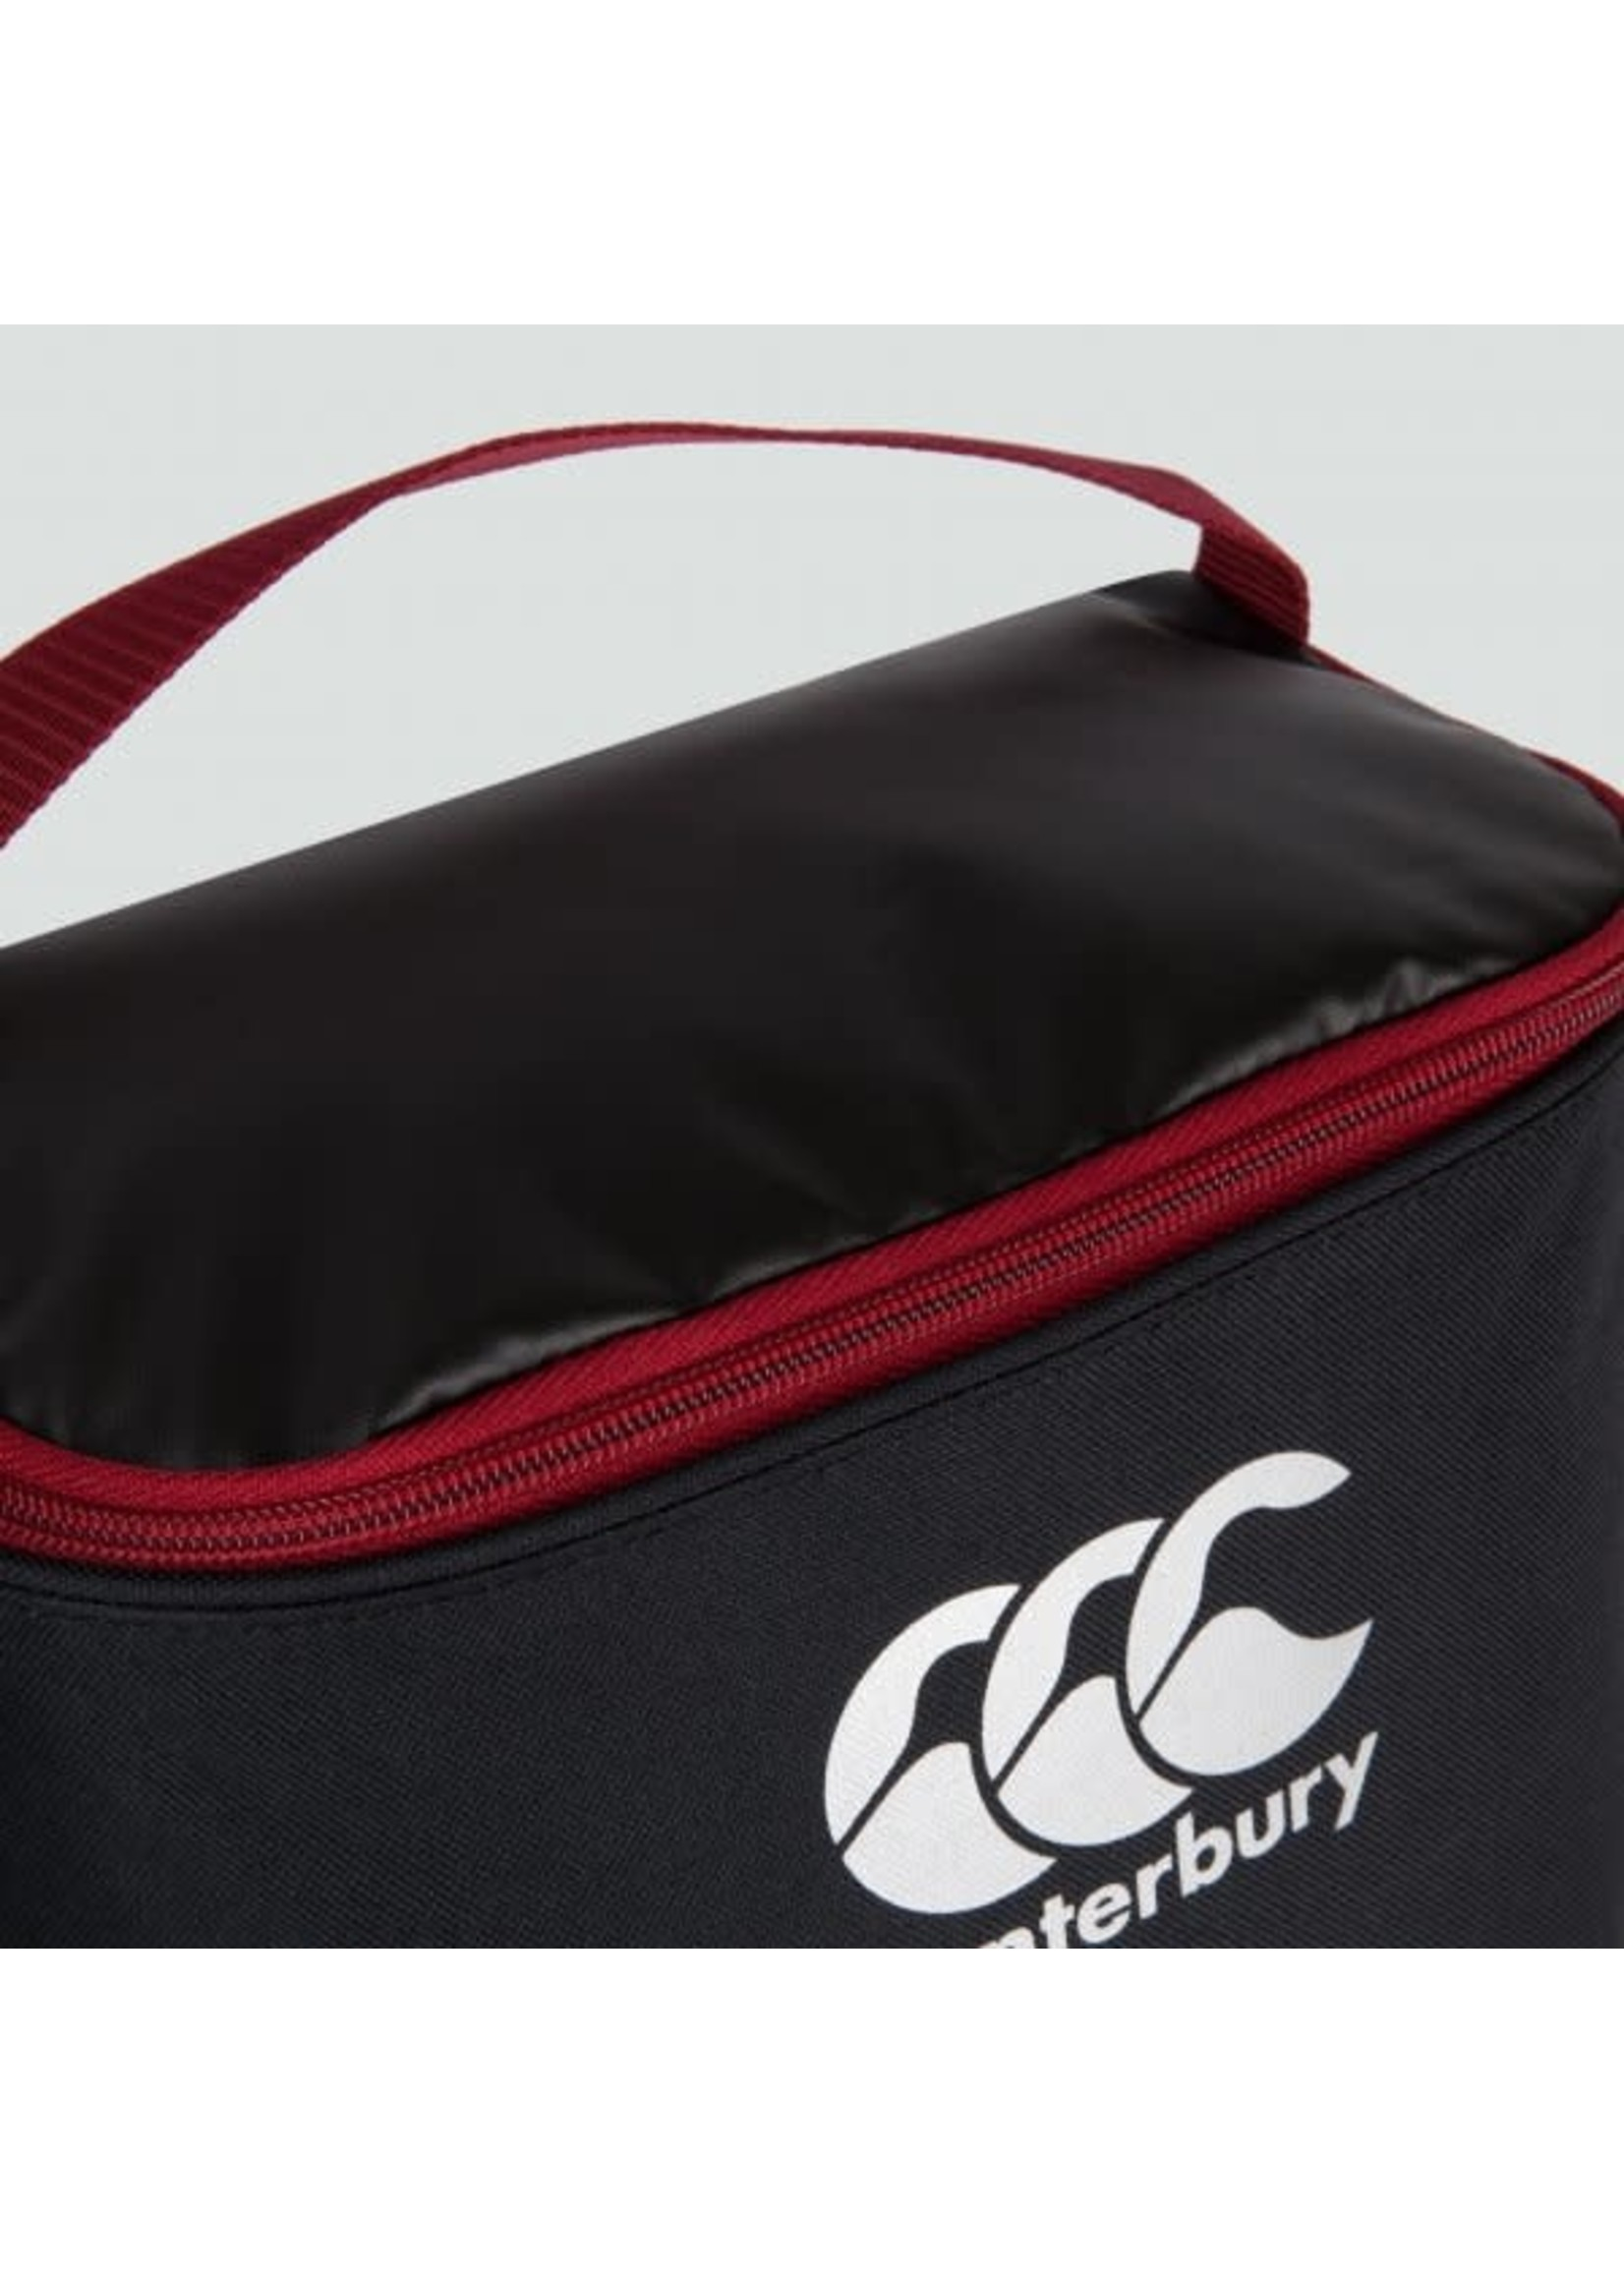 Canterbury Canterbury Bootbag (2020) - Black/Red